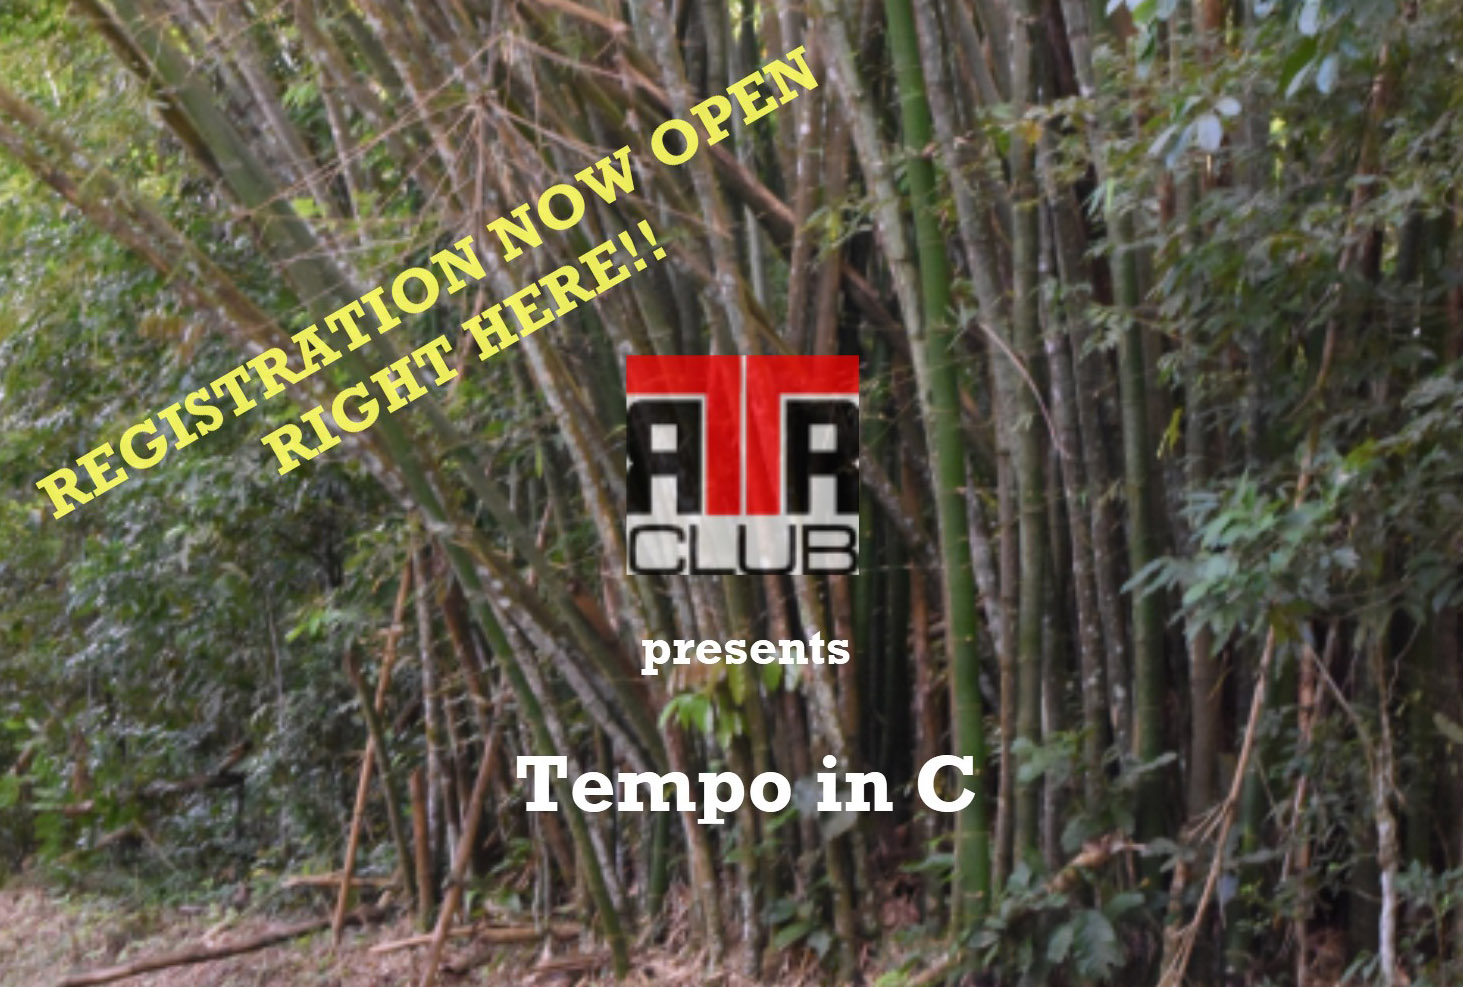 TTRRC is back!!  REGISTER HERE